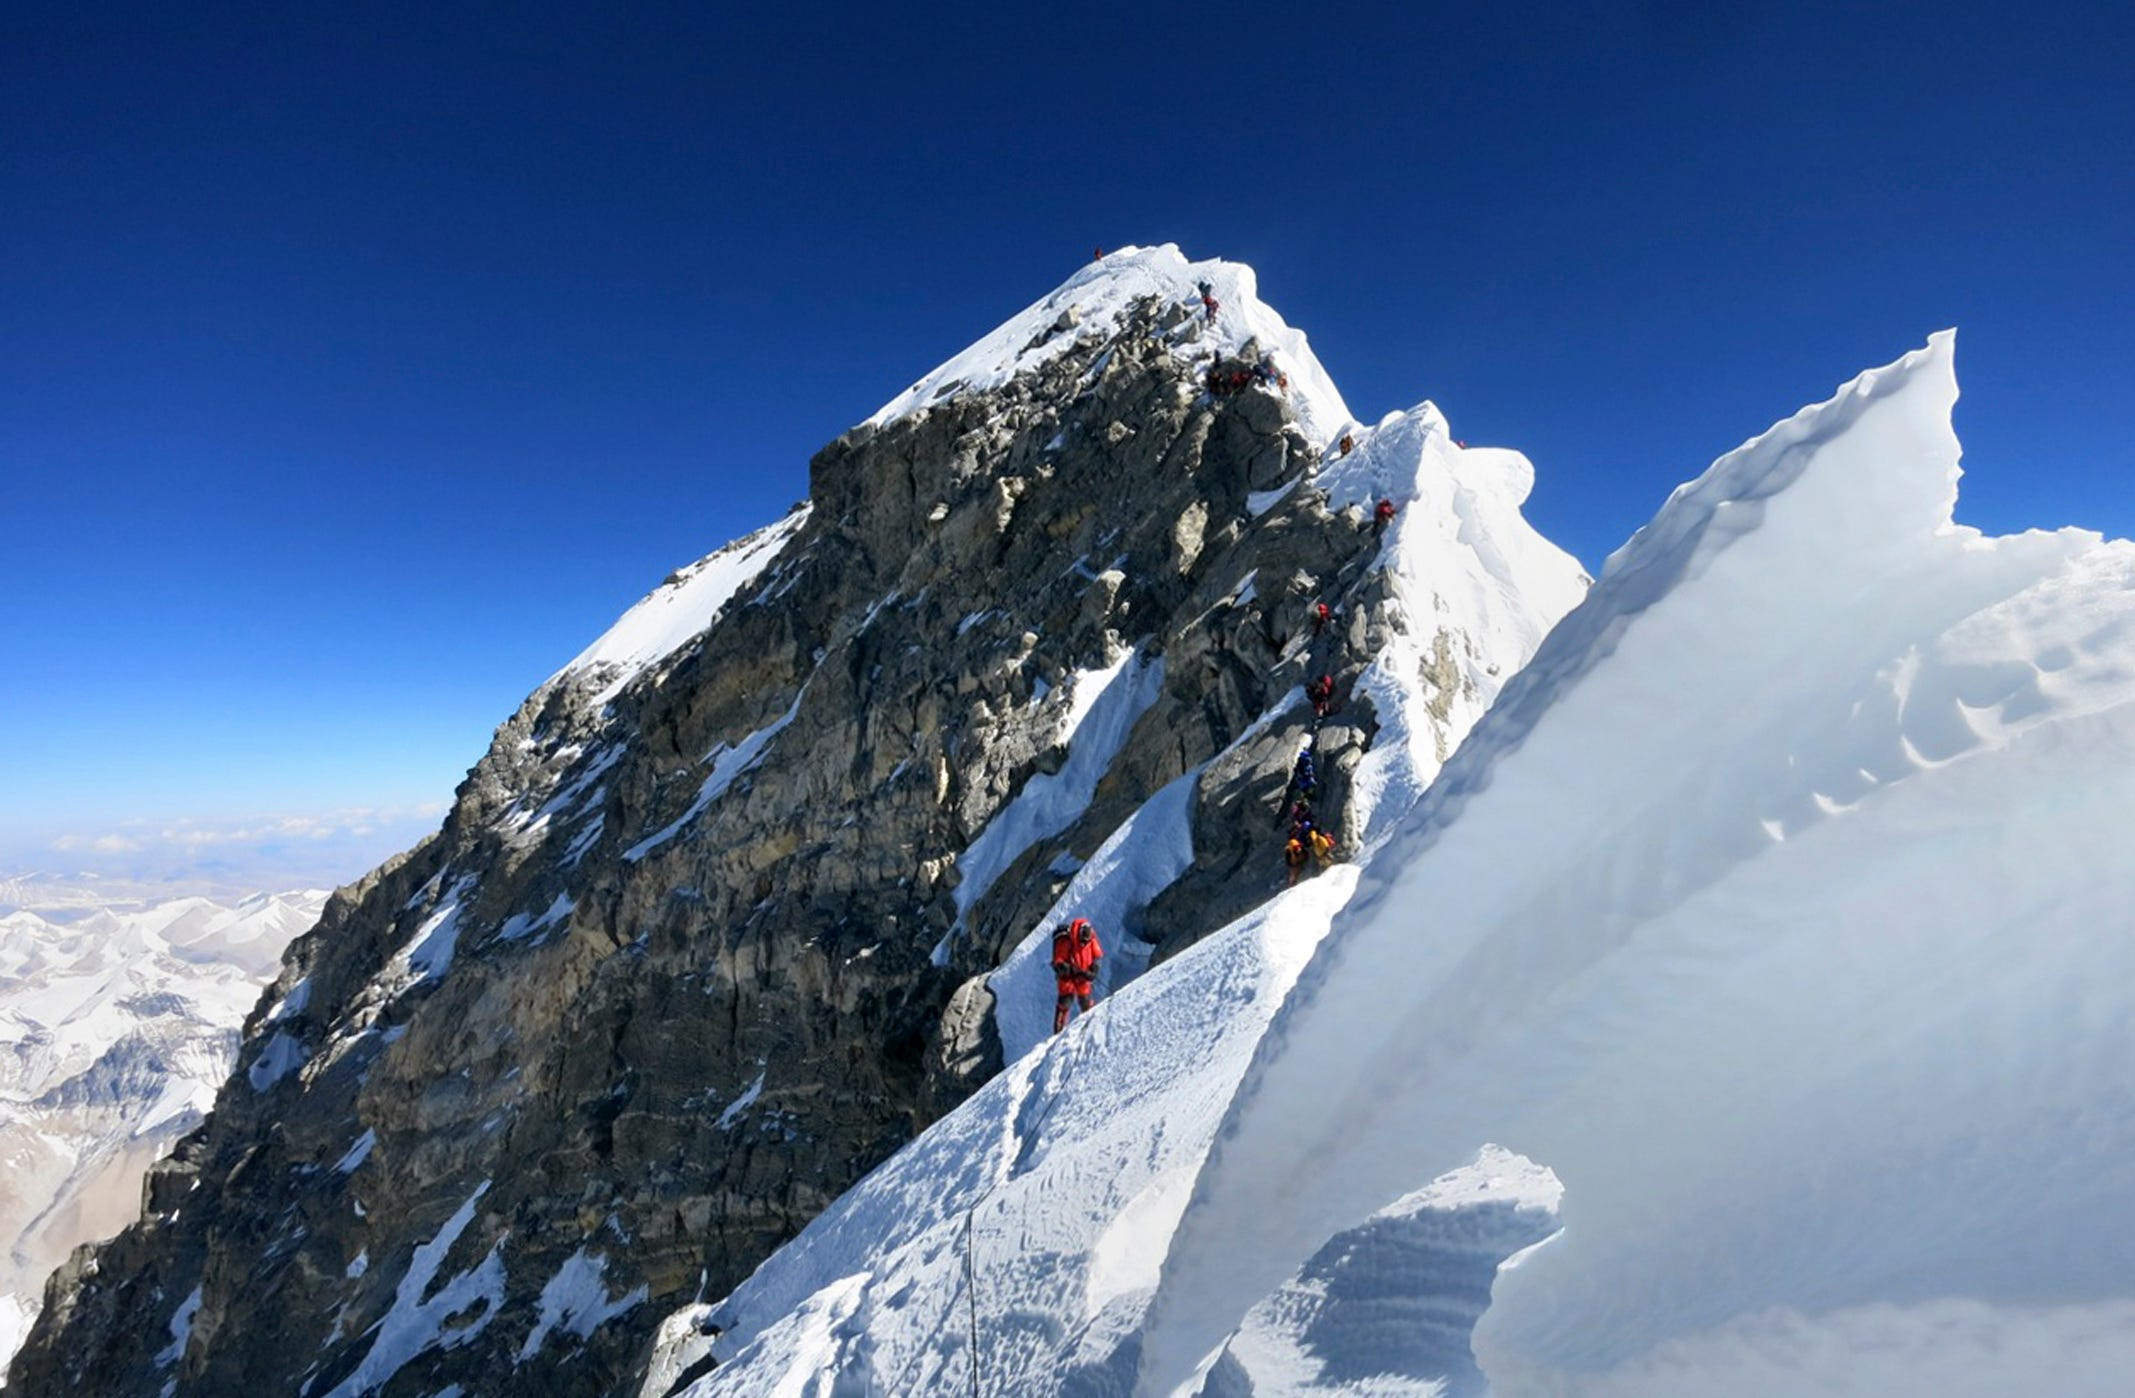 anatoli boukreev the climb pdf